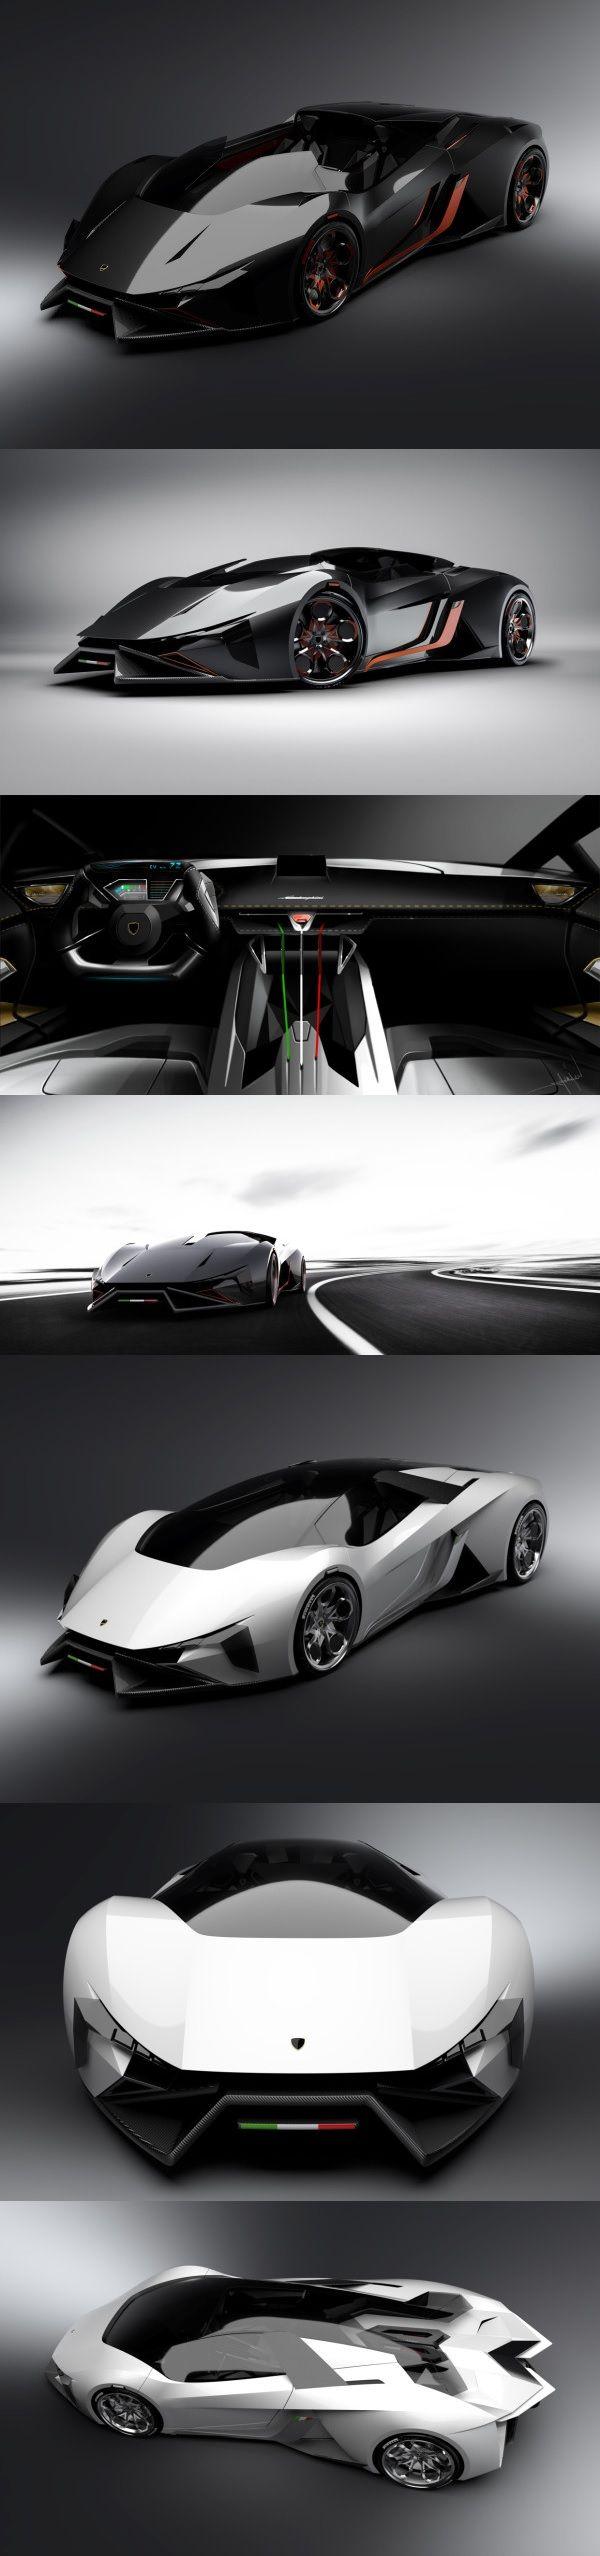 Lamborghini Diamante 2023 – Thomas Granjard Concept